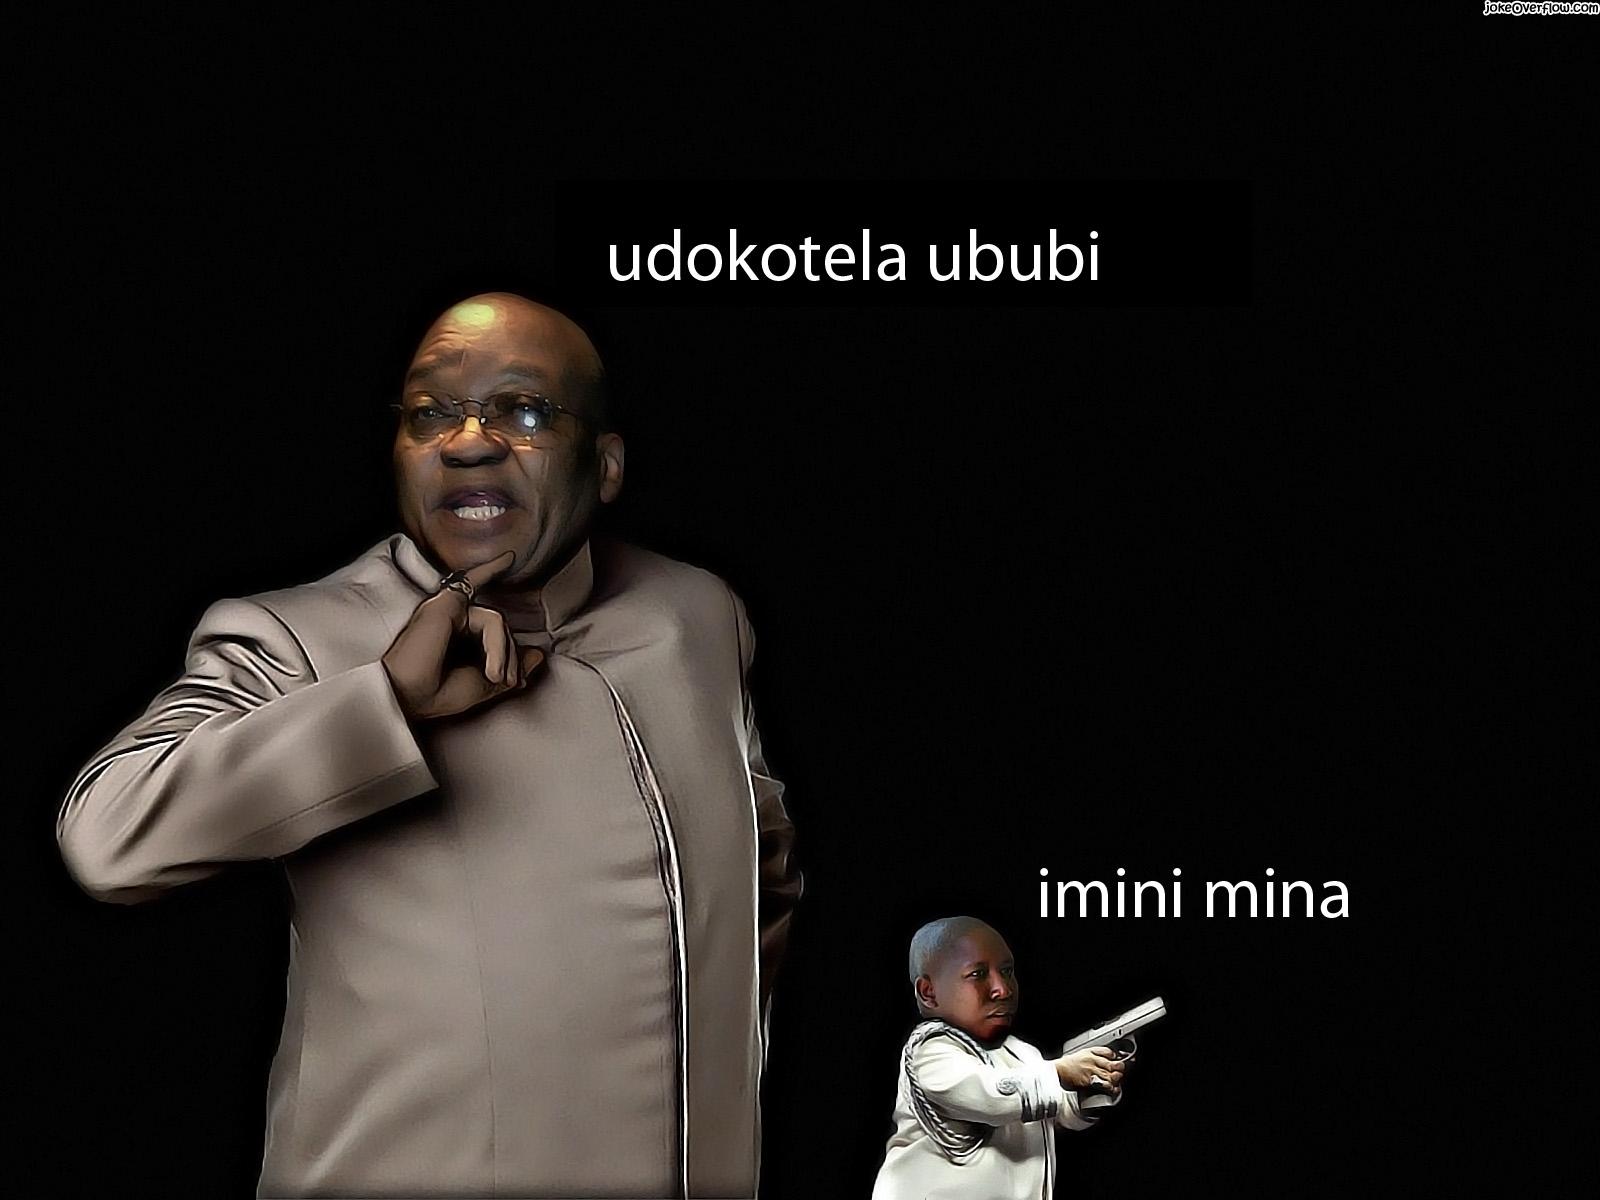 Zuma and Malema mini me